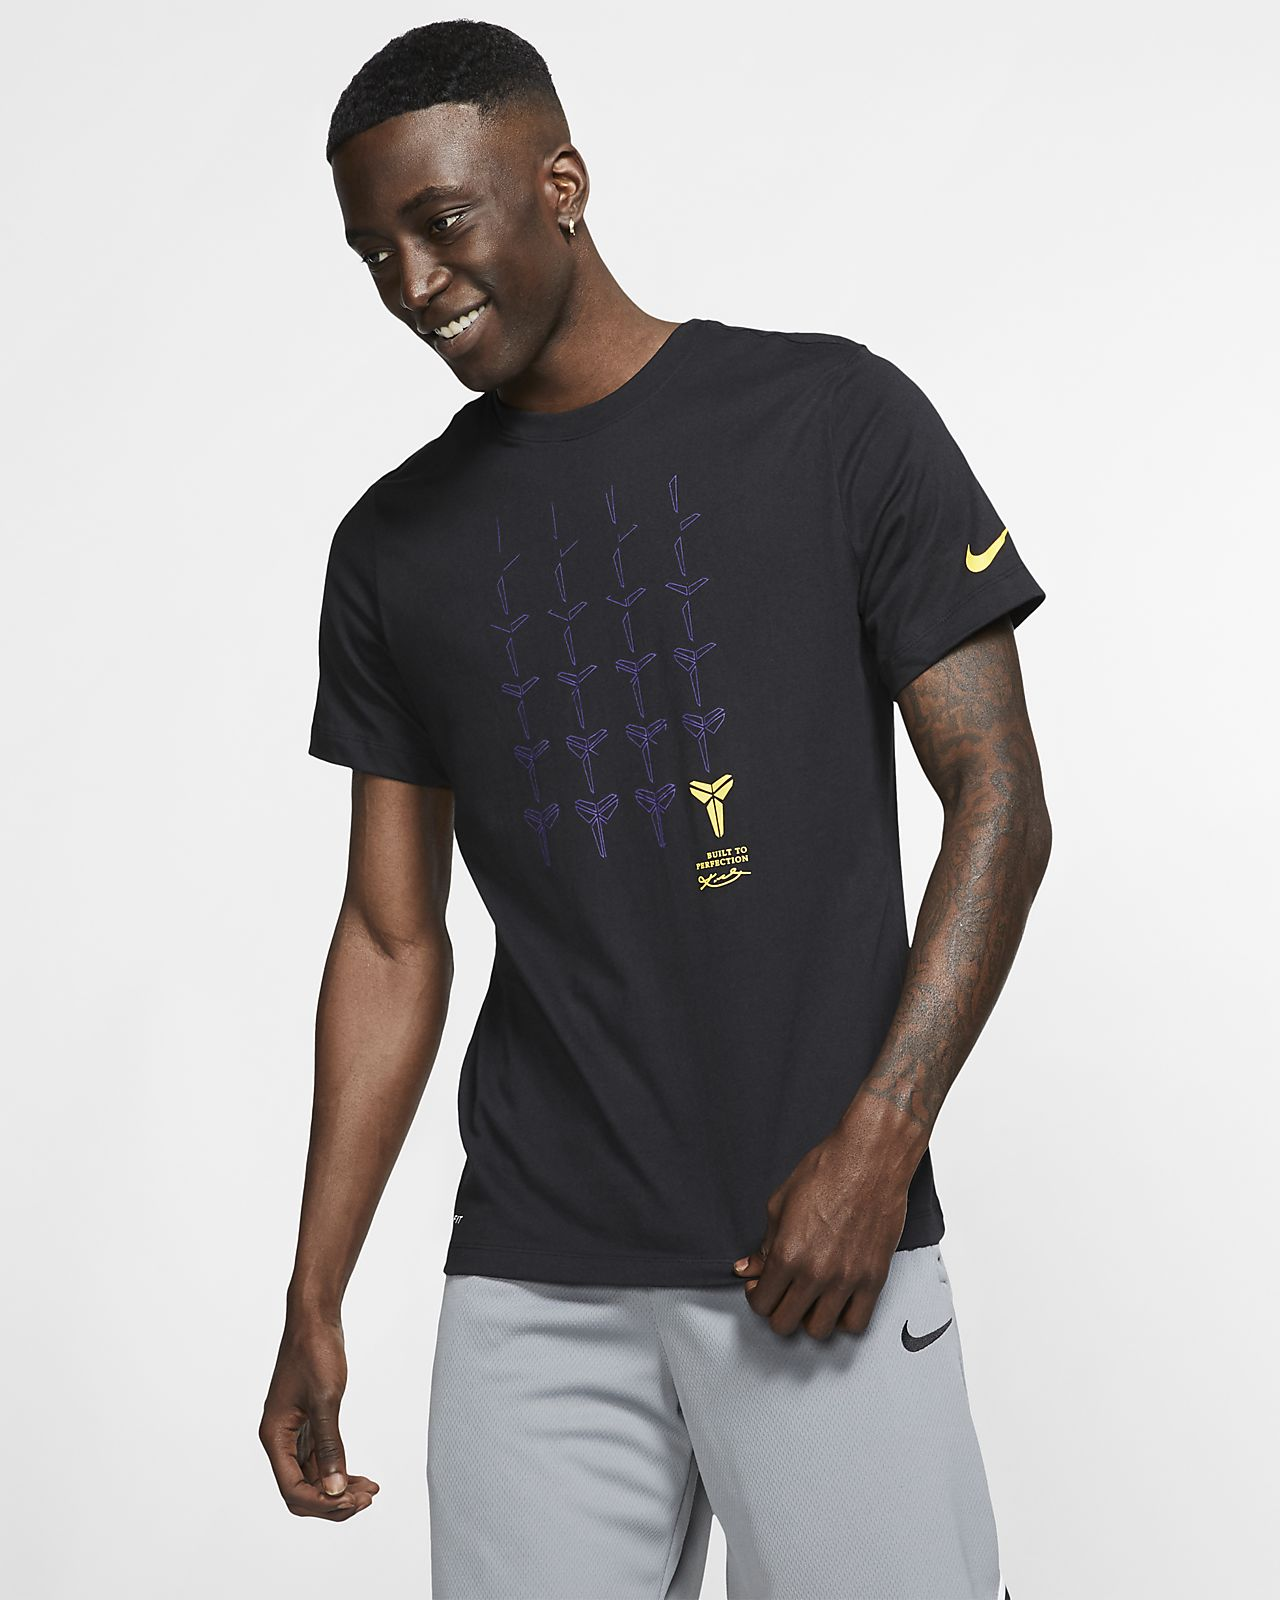 Nike Dri-FIT Kobe T-shirt voor heren